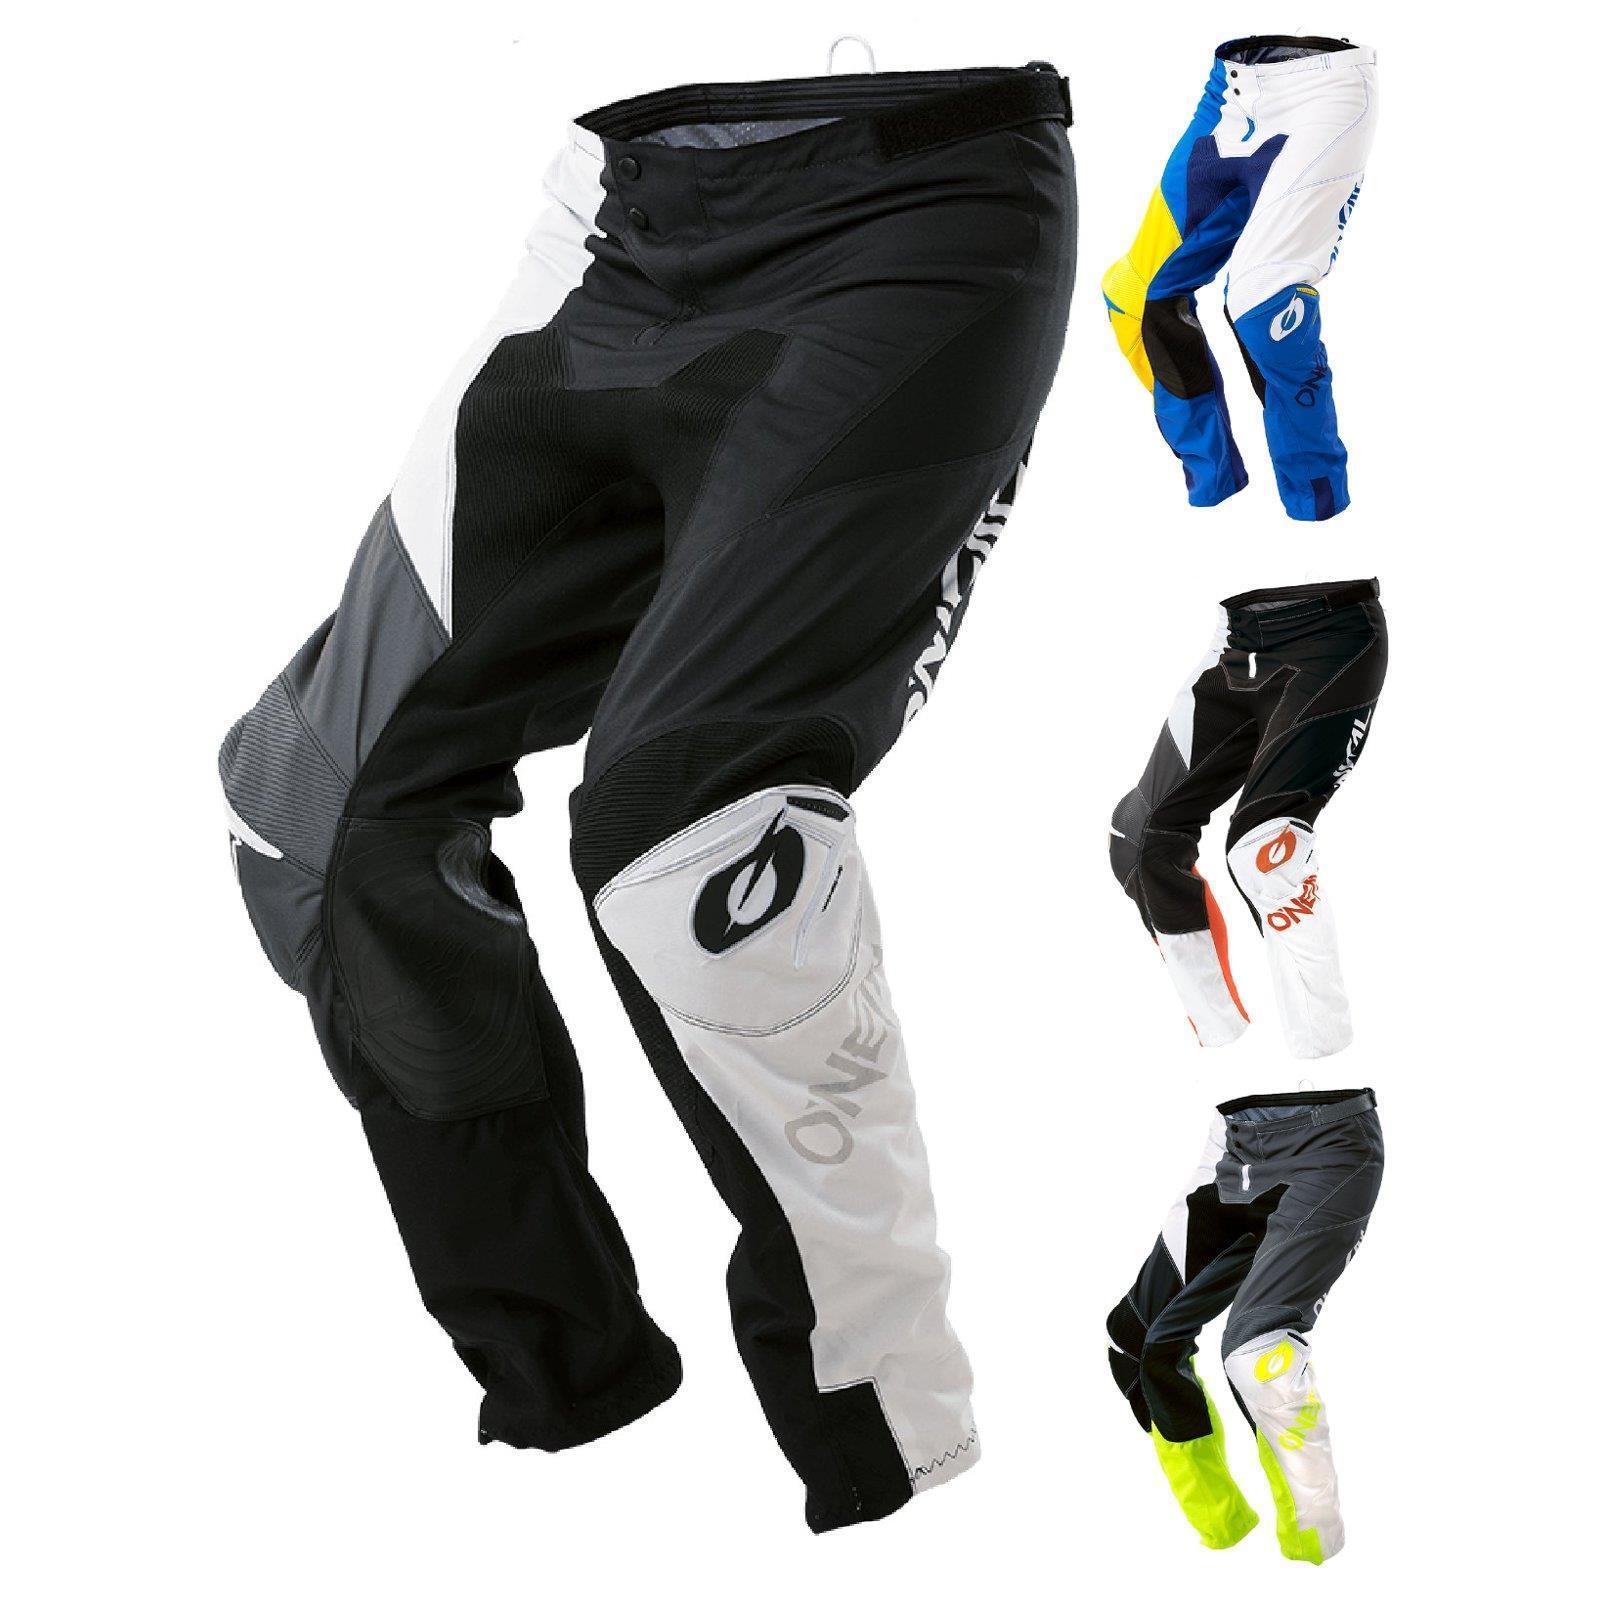 ONeal Mayhem Lite Split MX Moto Cross Pantalon Enduro VTT MTB alpin Pant